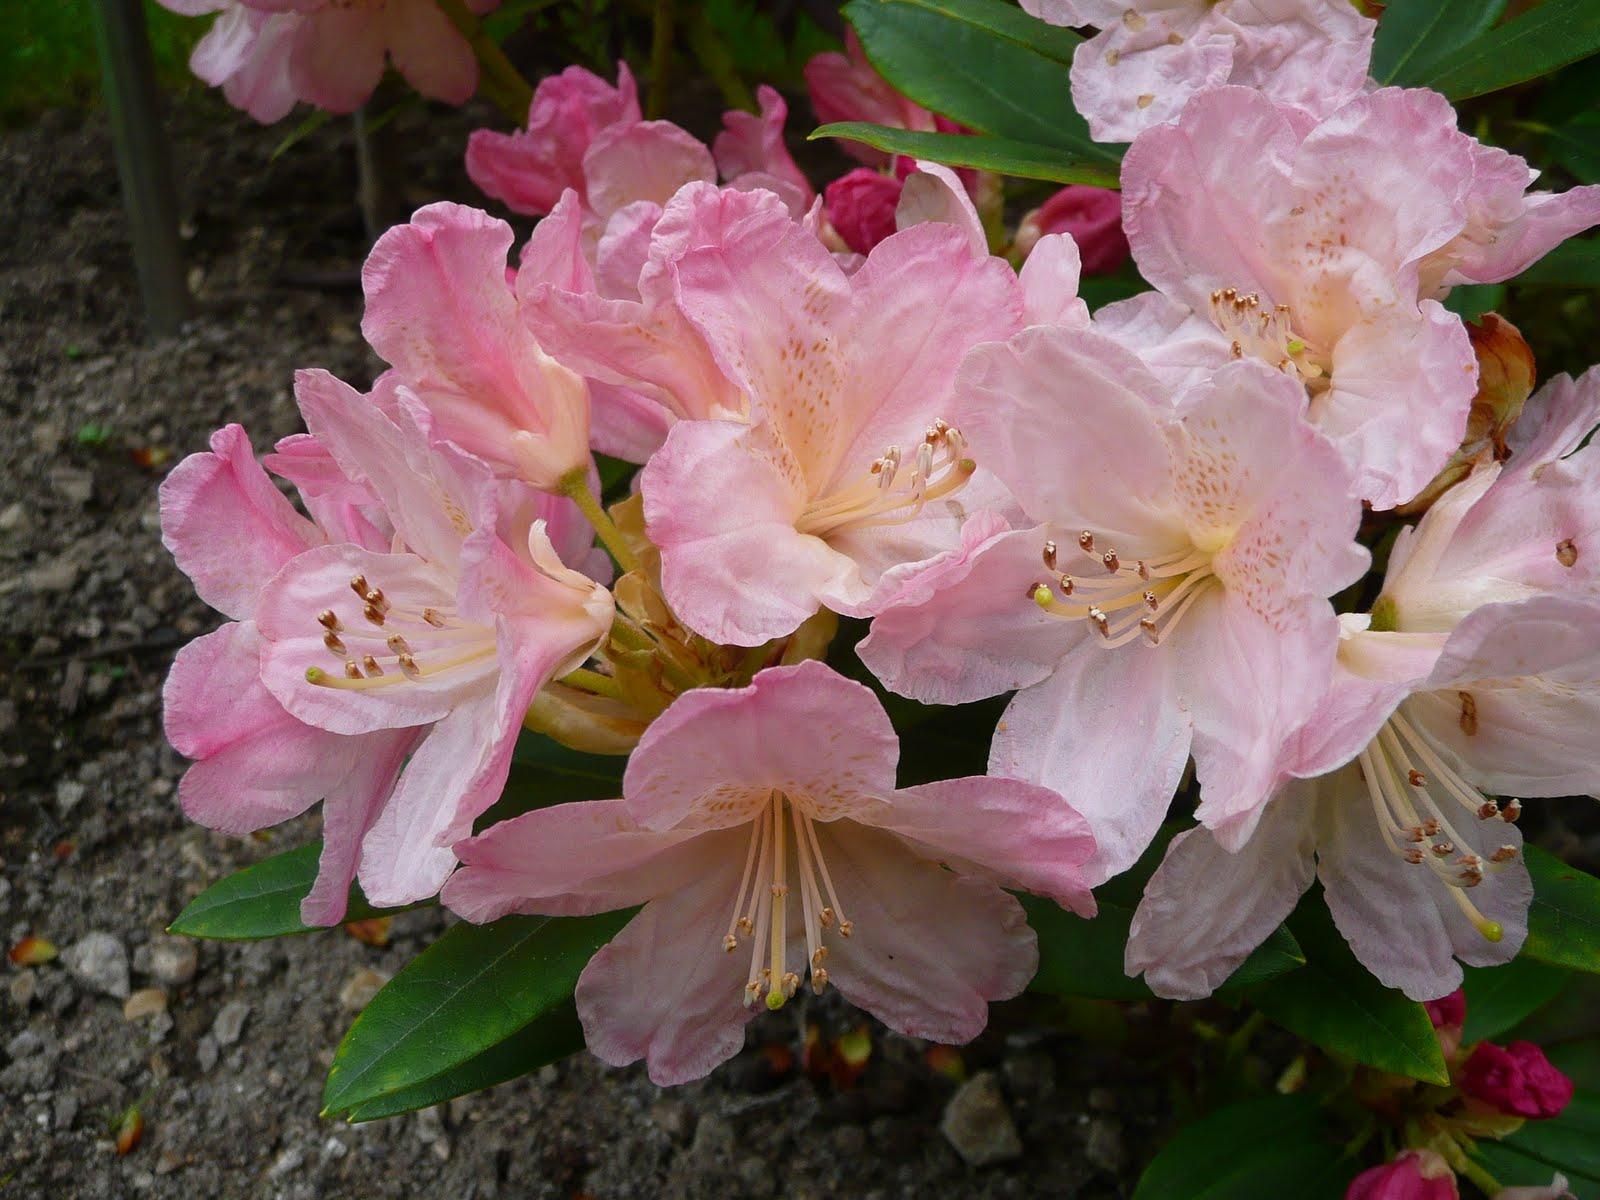 Notre jardin secret rhododendrons - Rhododendron ne fleurit pas ...